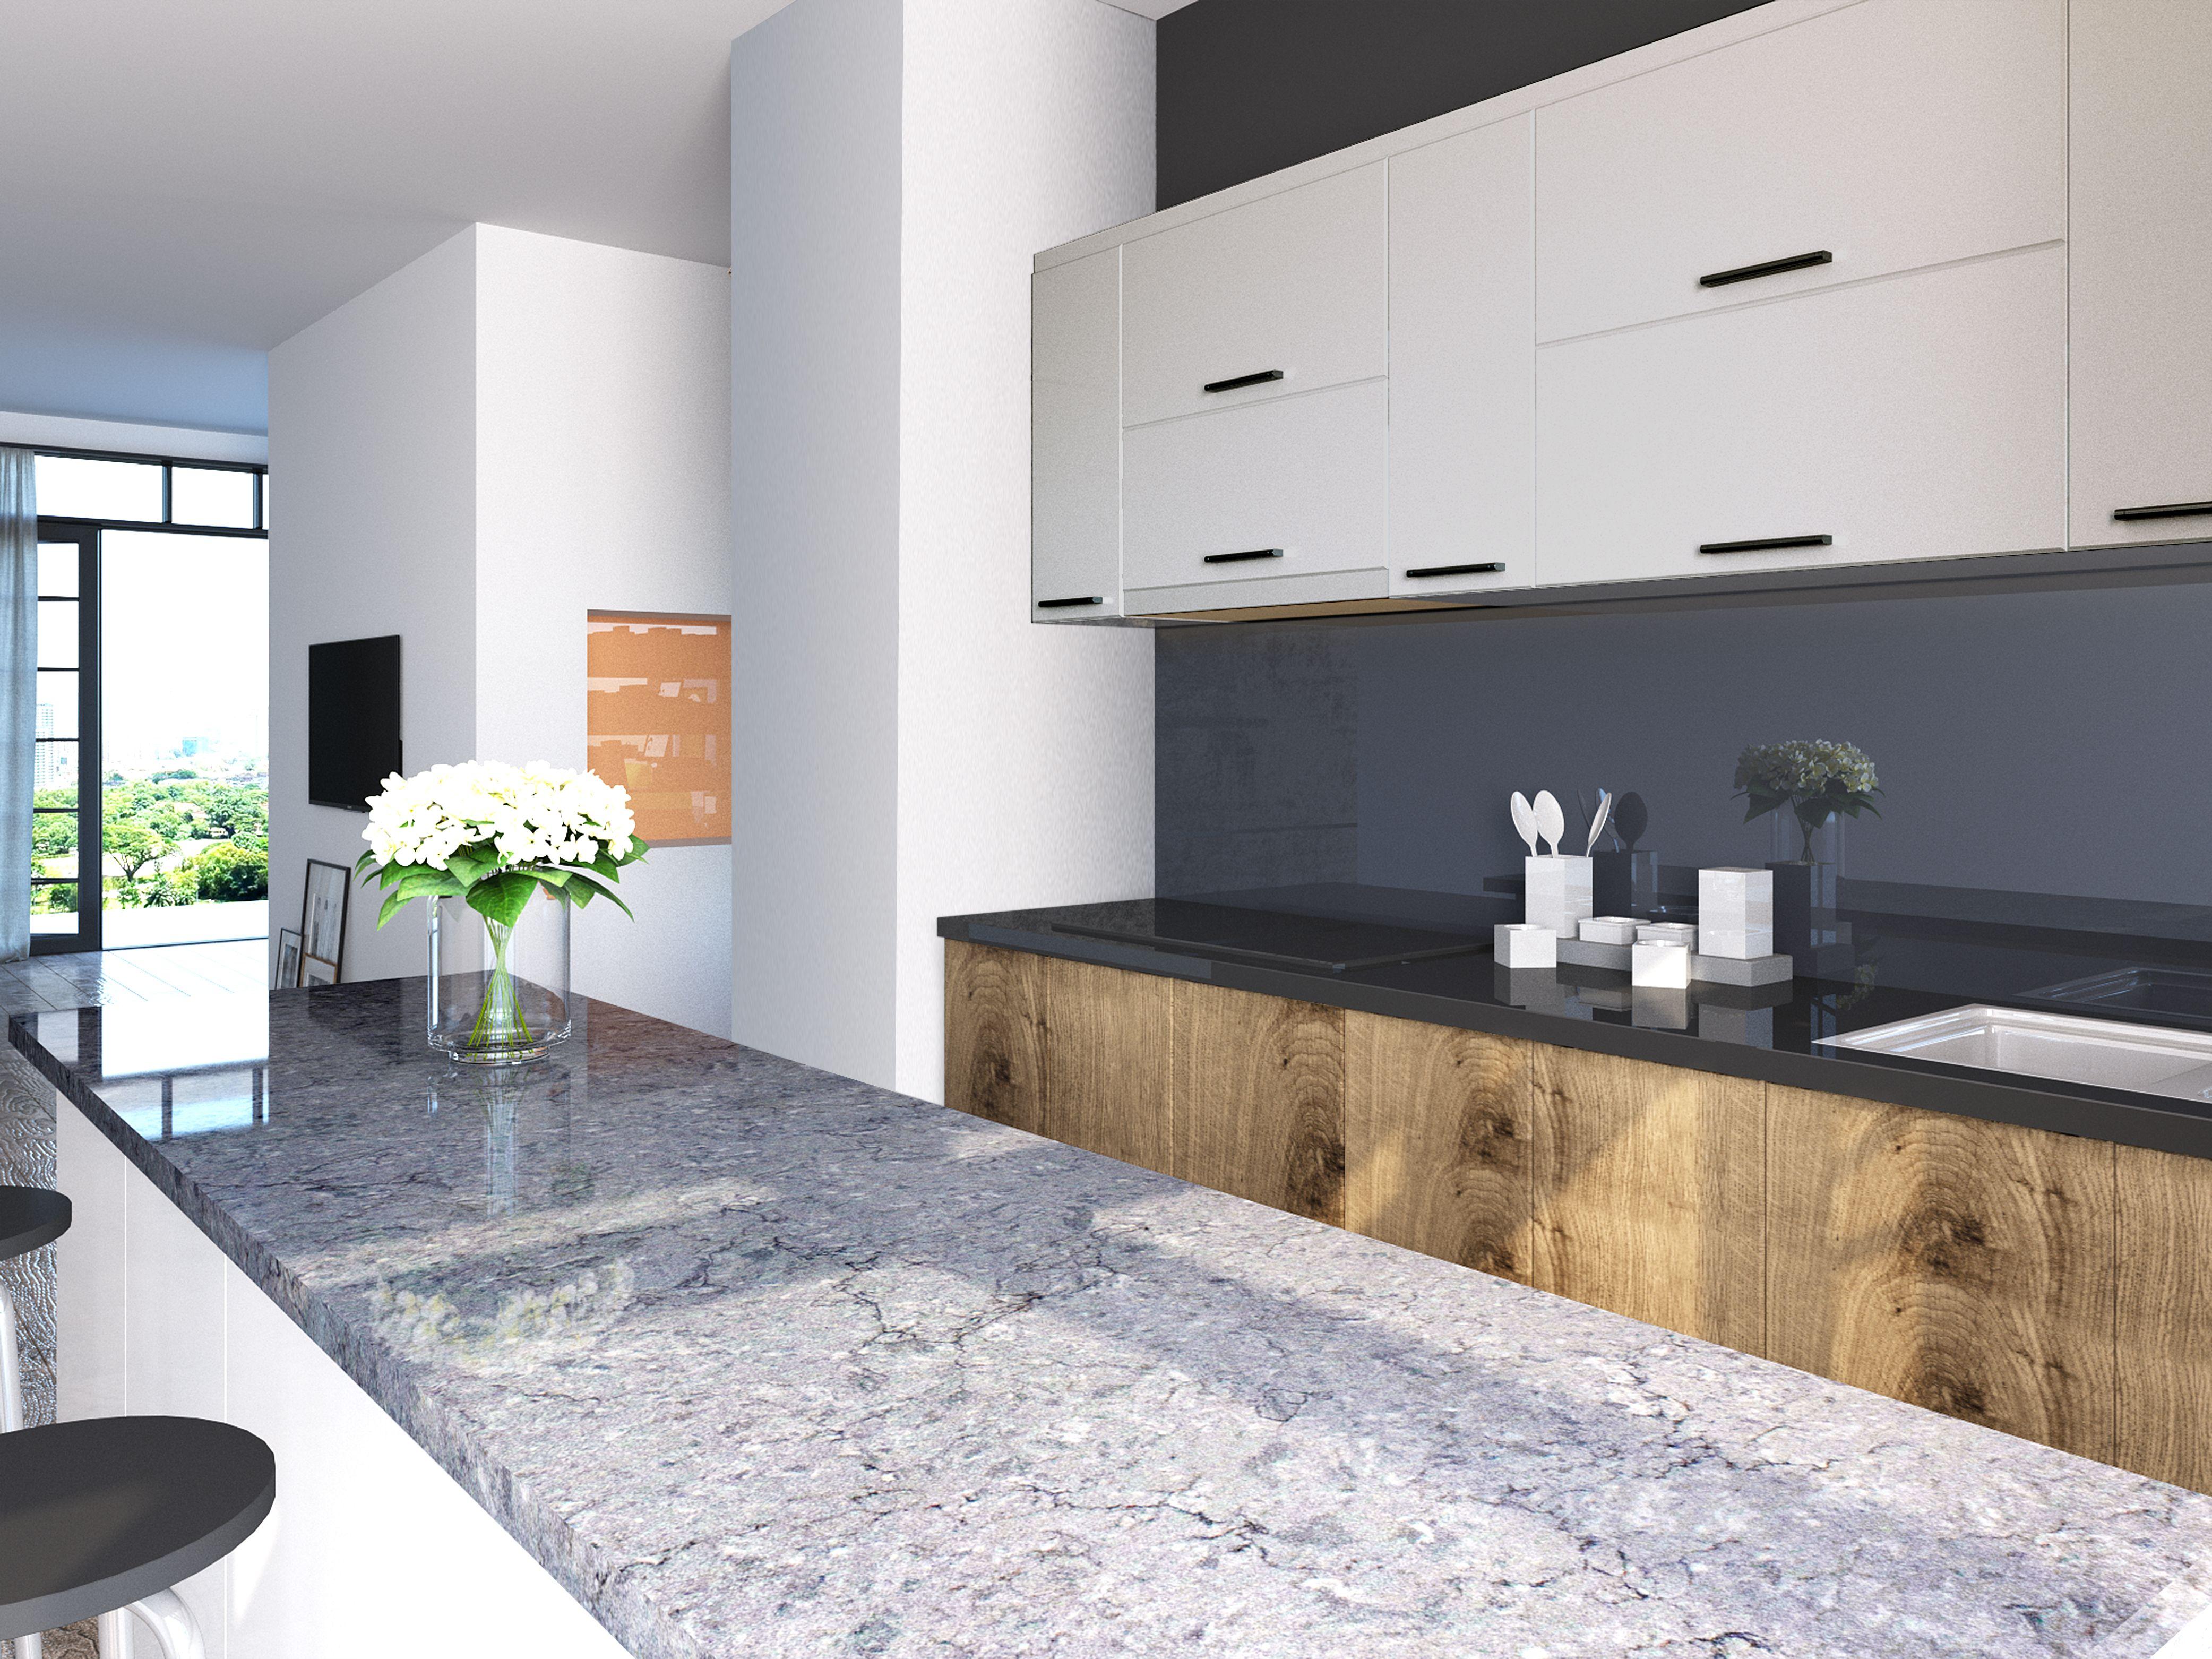 BQ8816 - Blue Savoy #Vicostone #Quartz #Countertops #interiordesigns ...